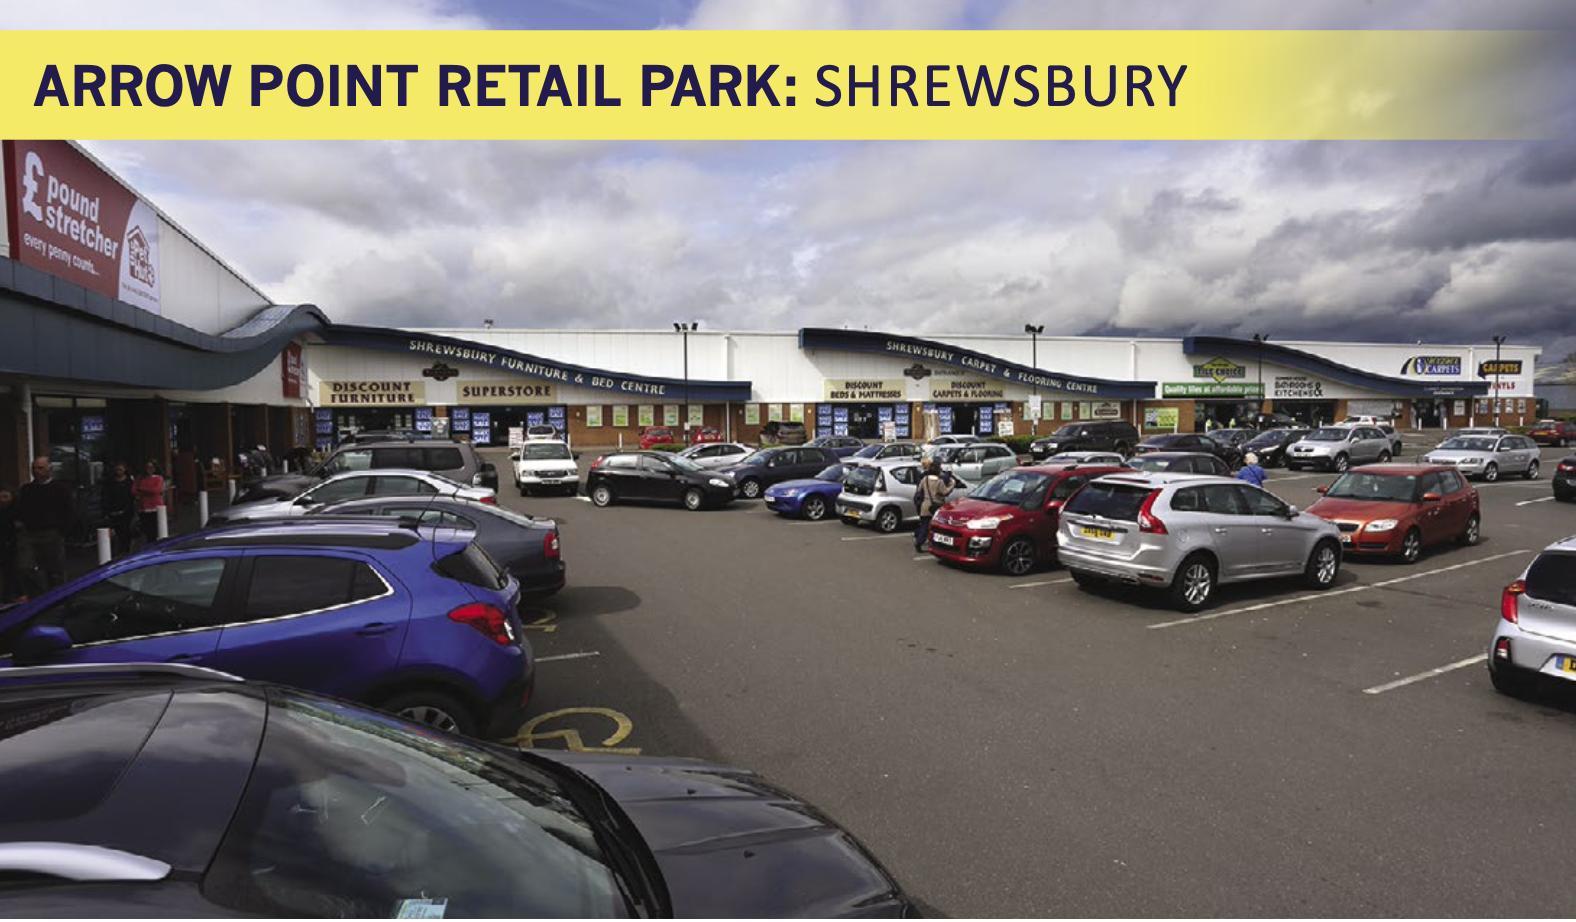 Arrow Point Retail Park